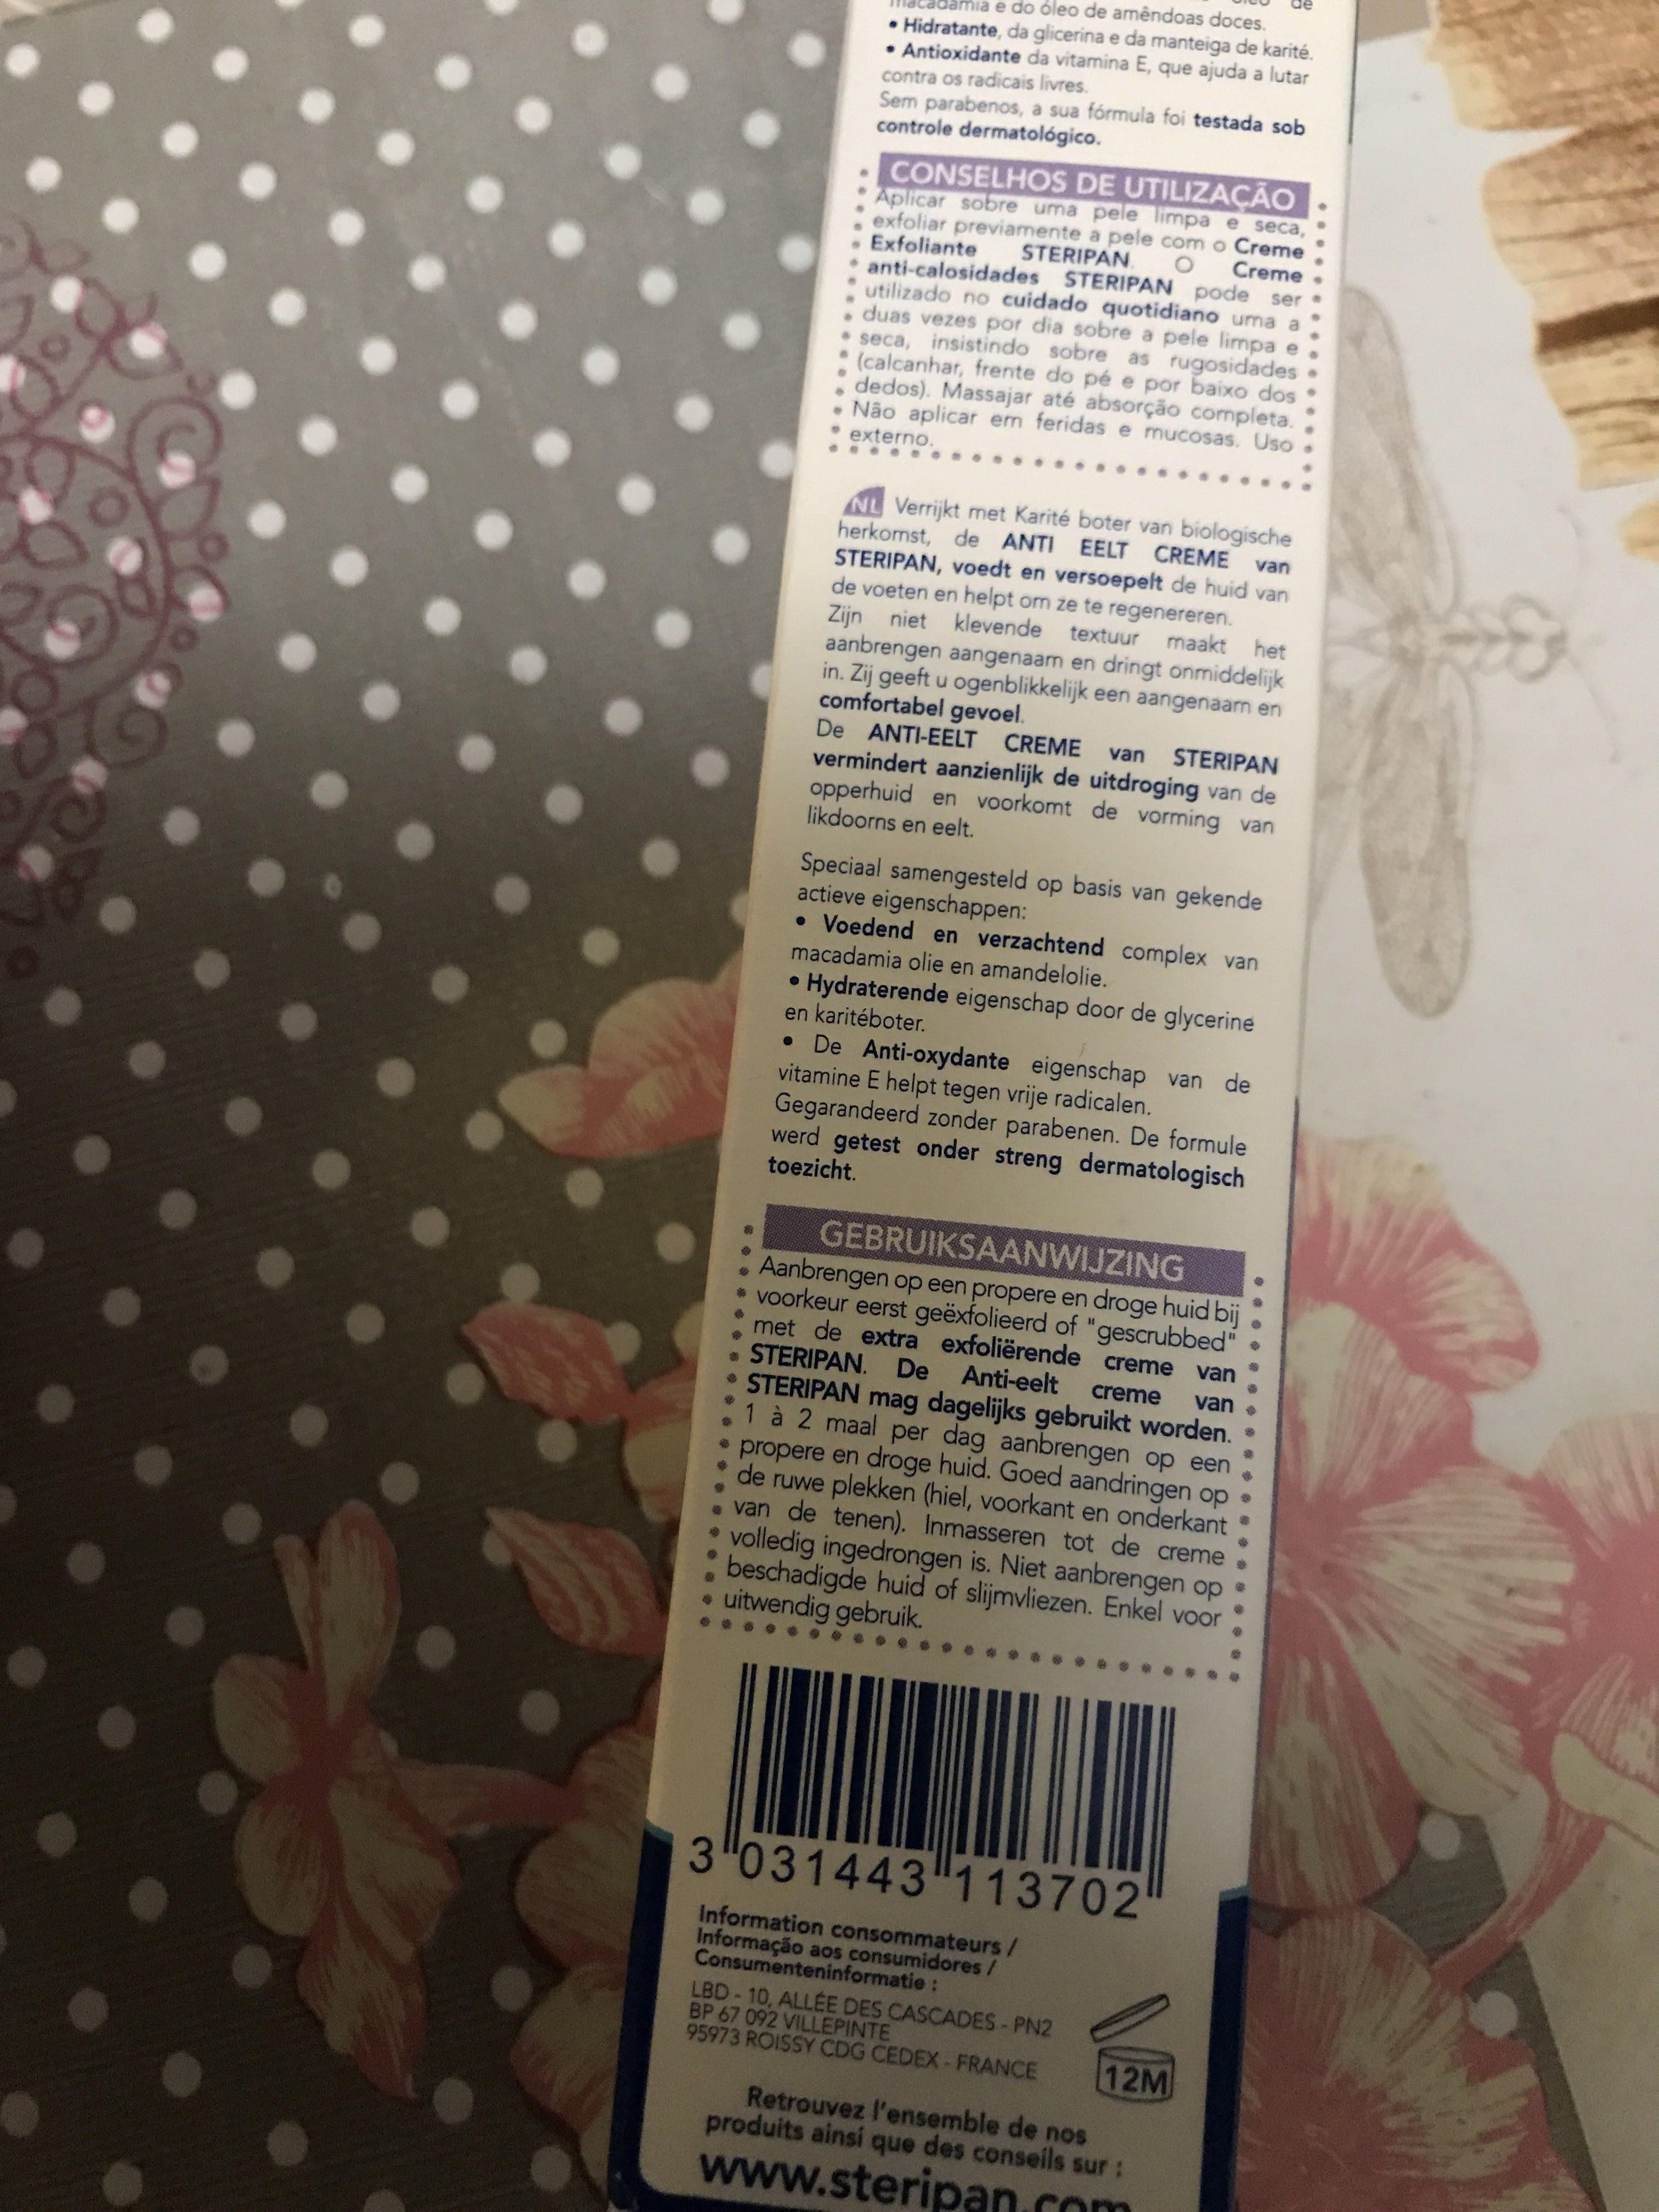 Cremedterioan anti calosofades - Product - fr